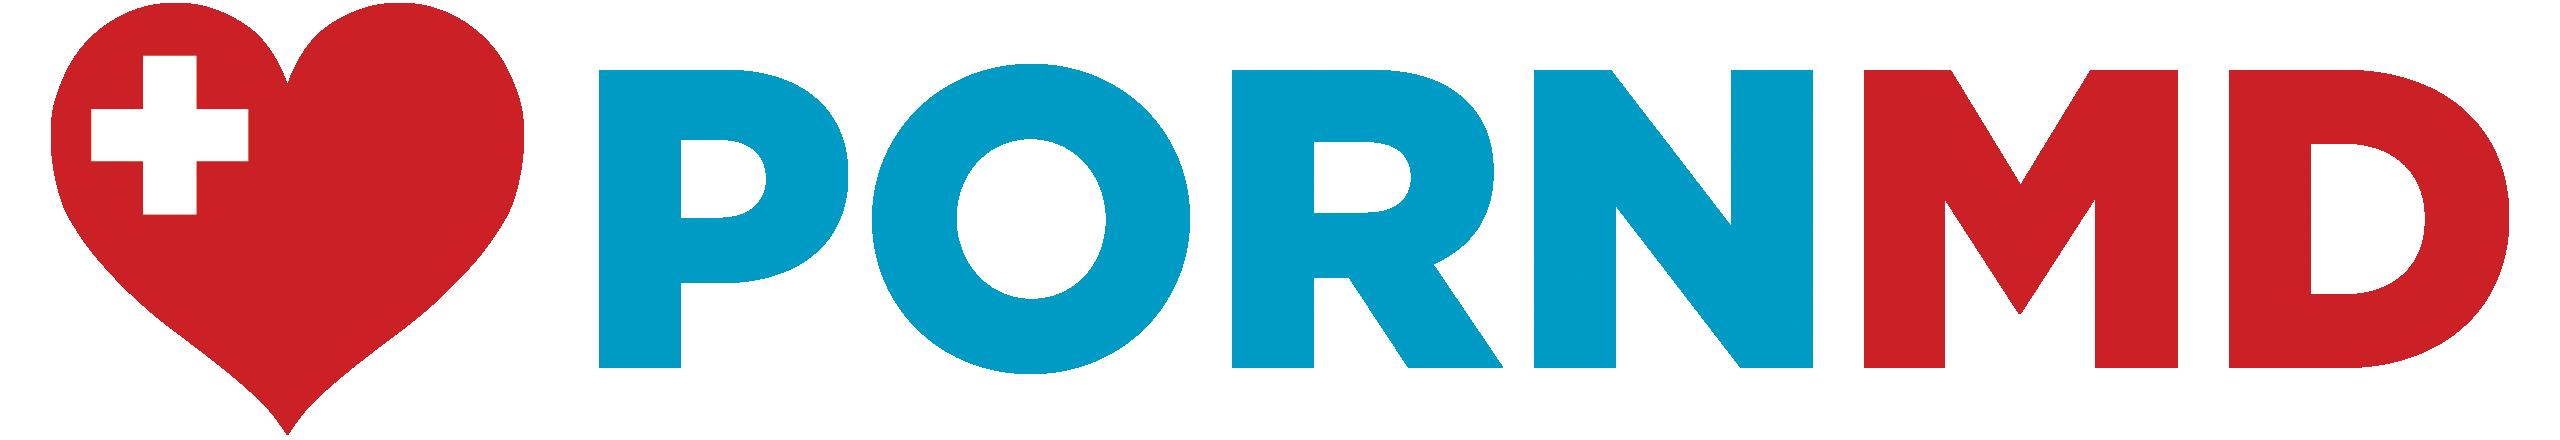 Pornmd logo